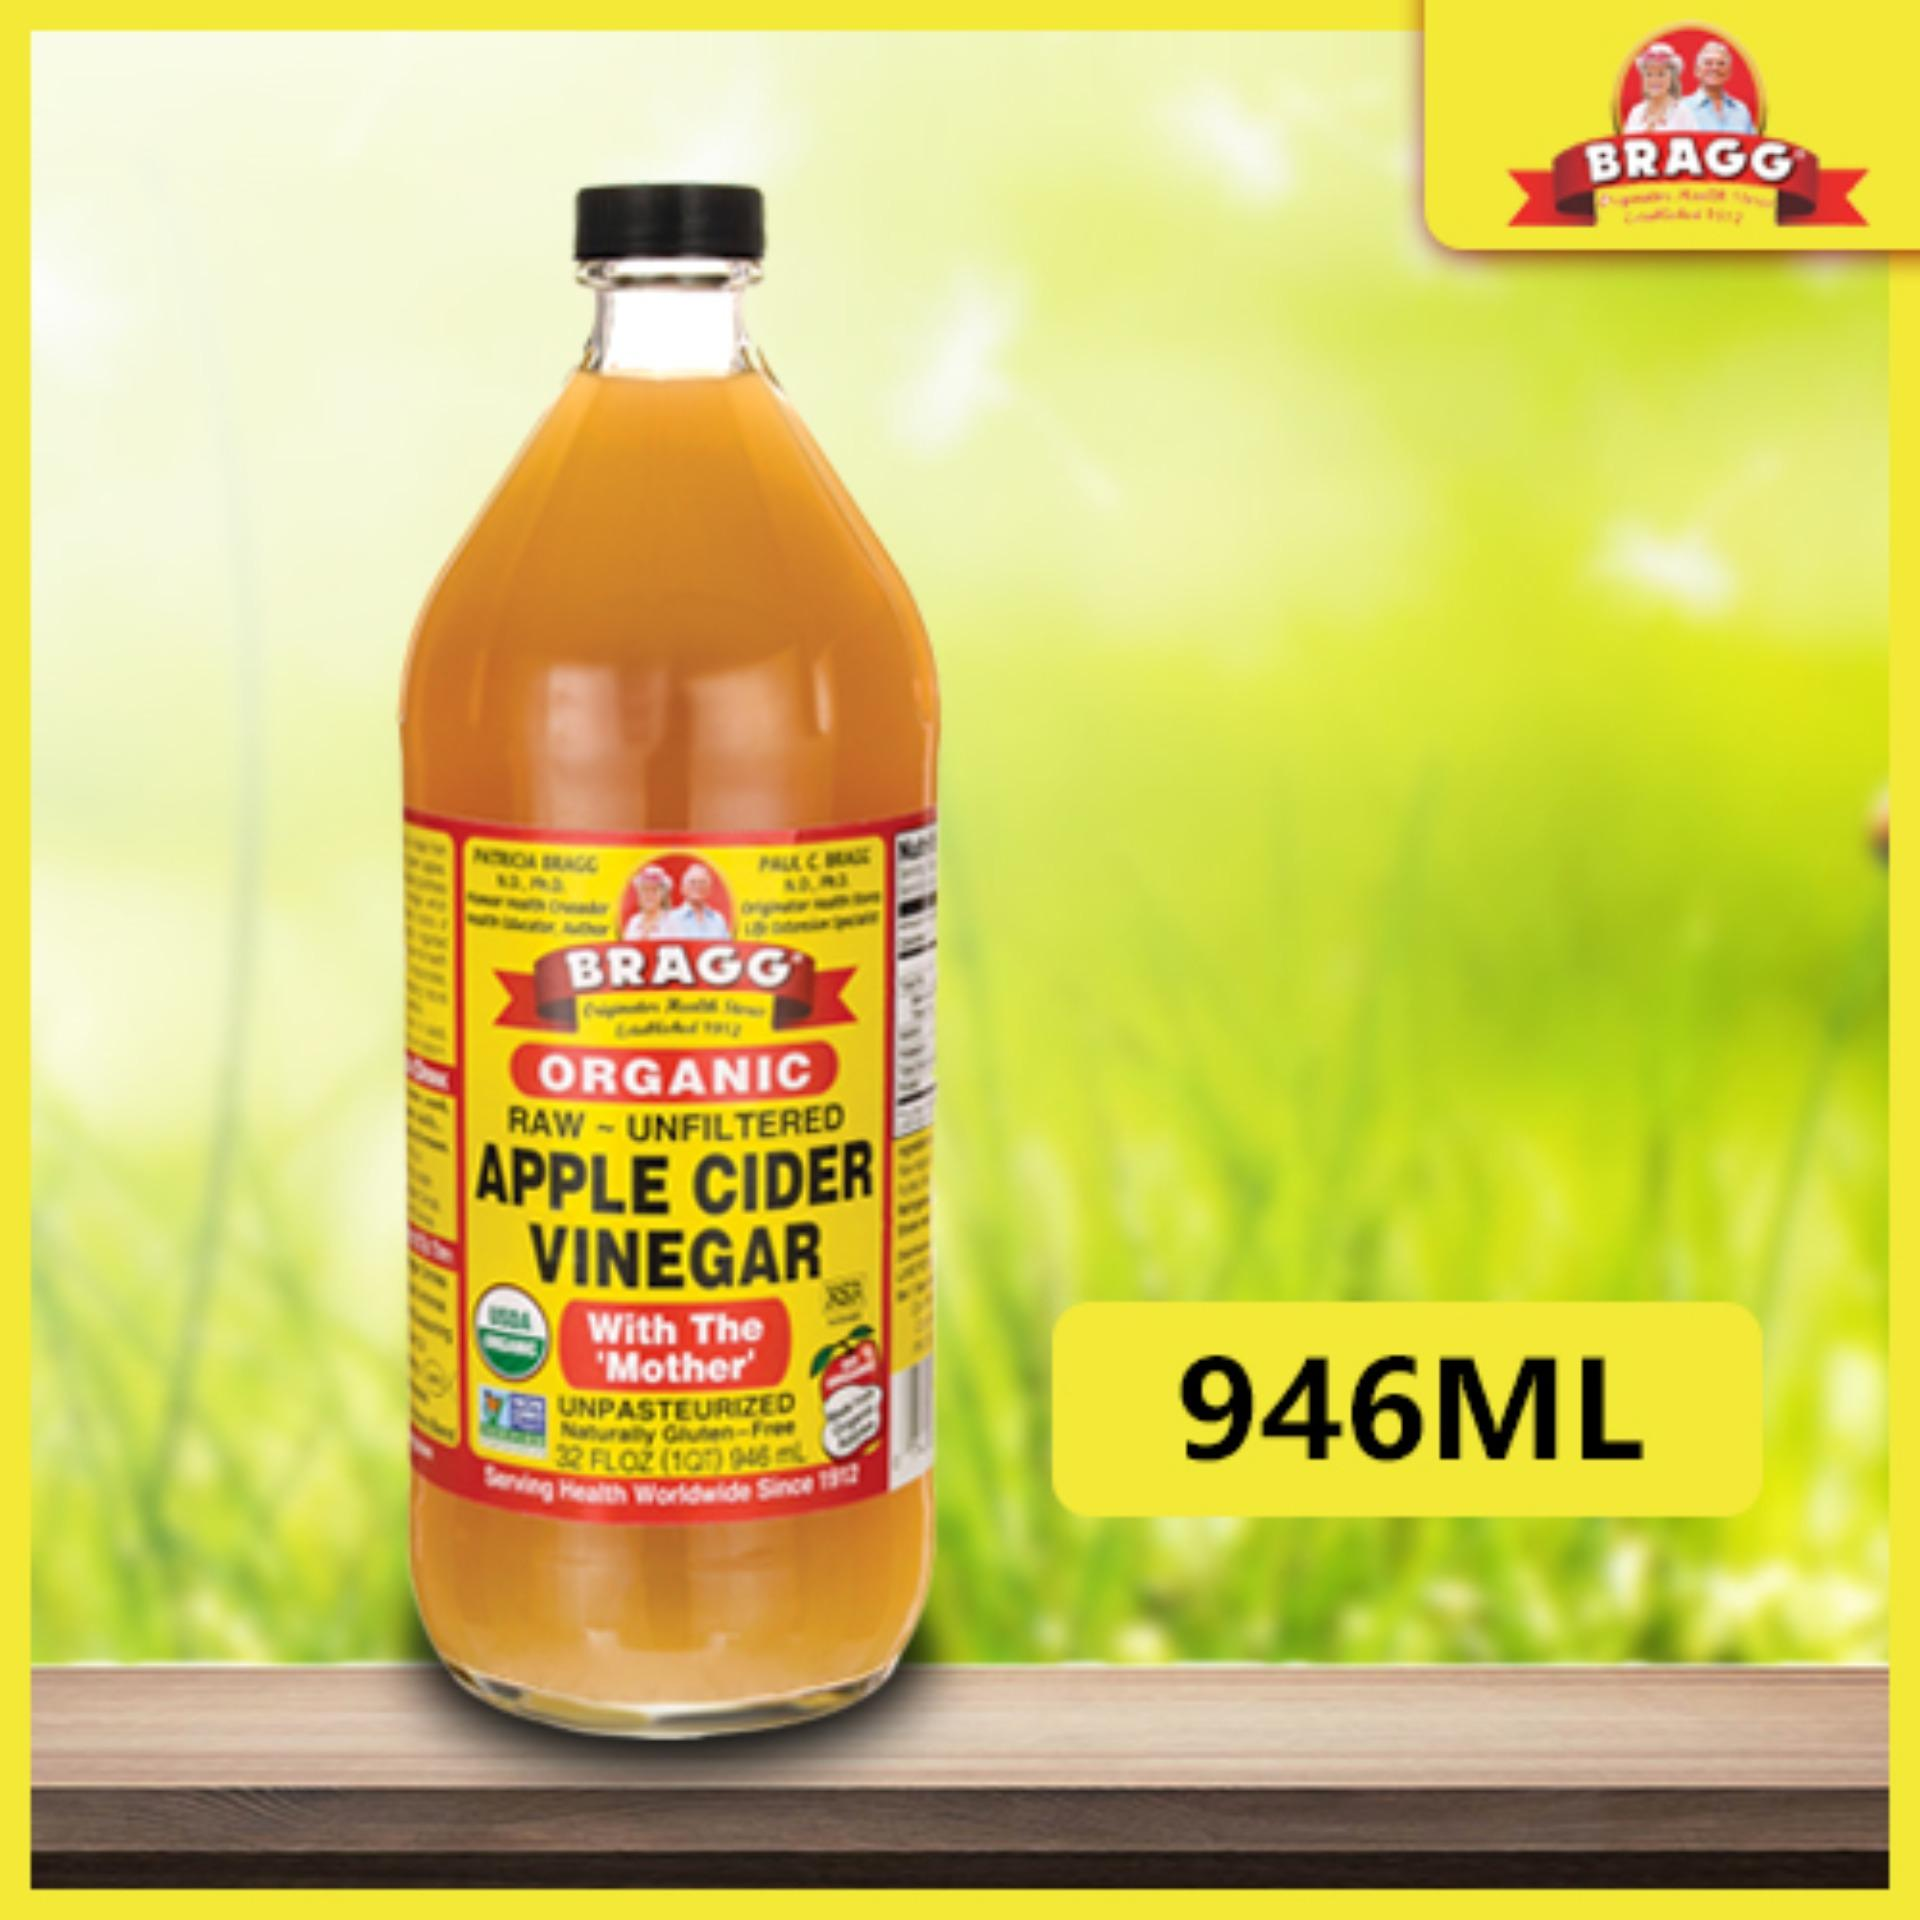 Bragg Organic Apple Cider Vinegar 946ml Singapore Shipping Product Of Usa Detox Organic Healthy Diet Wellness